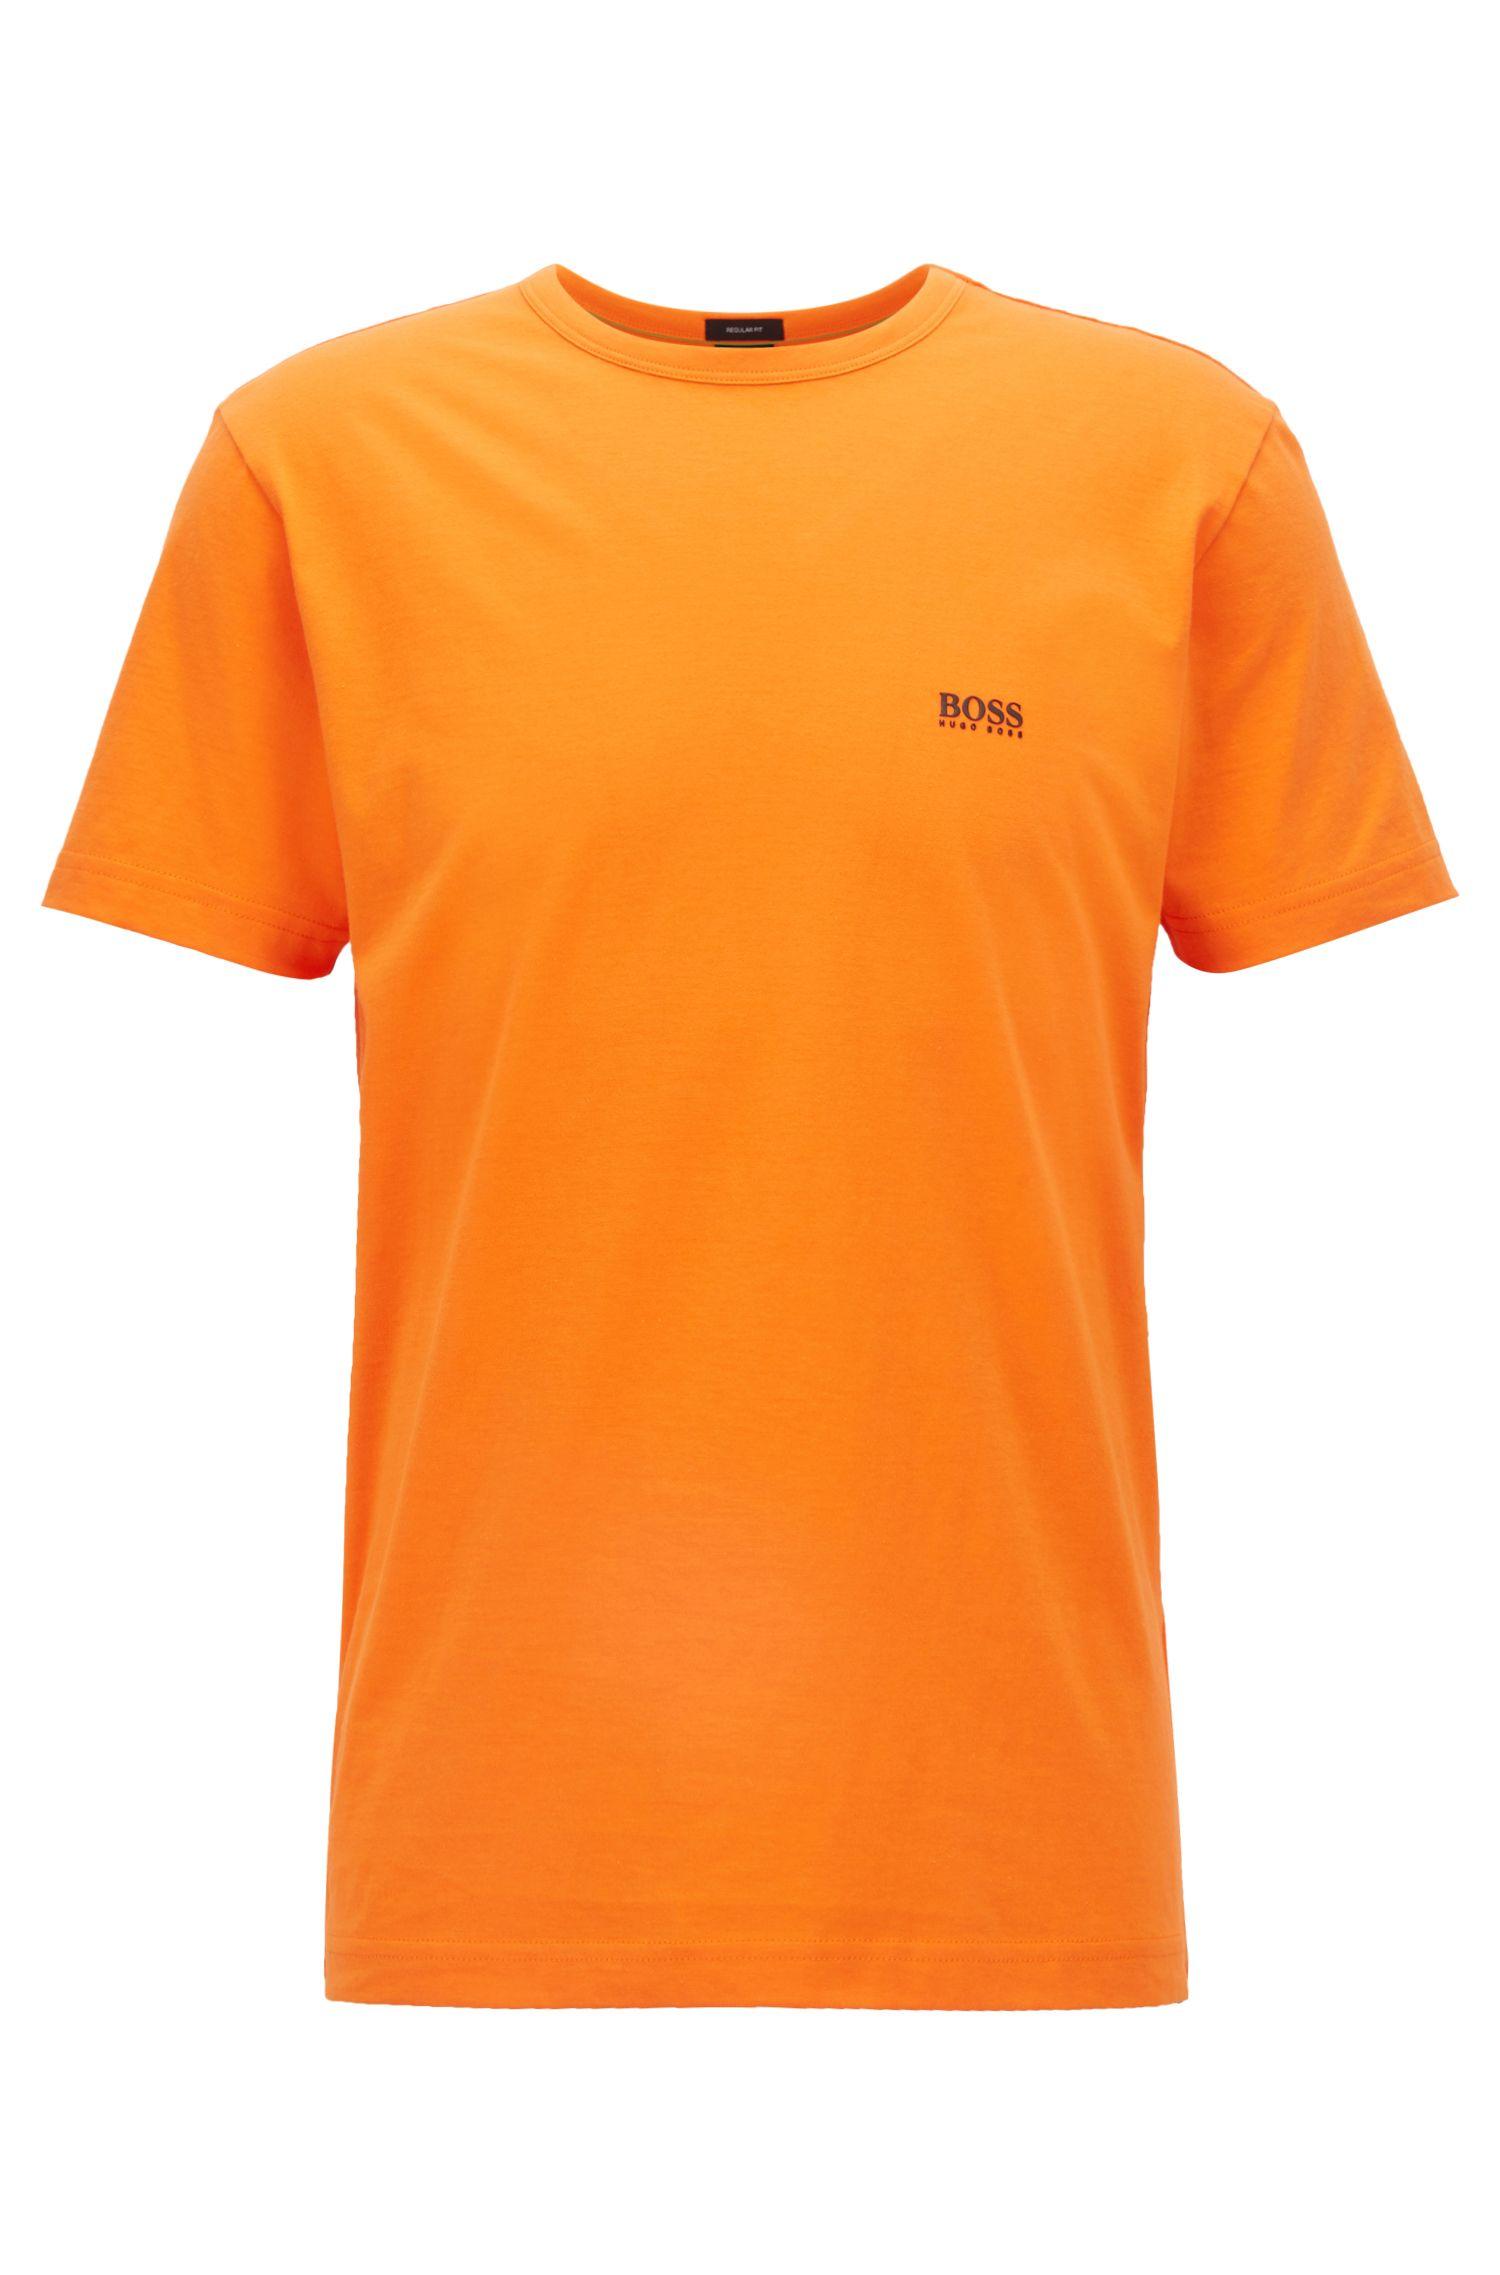 Regular-fit T-shirt in single jersey, Orange